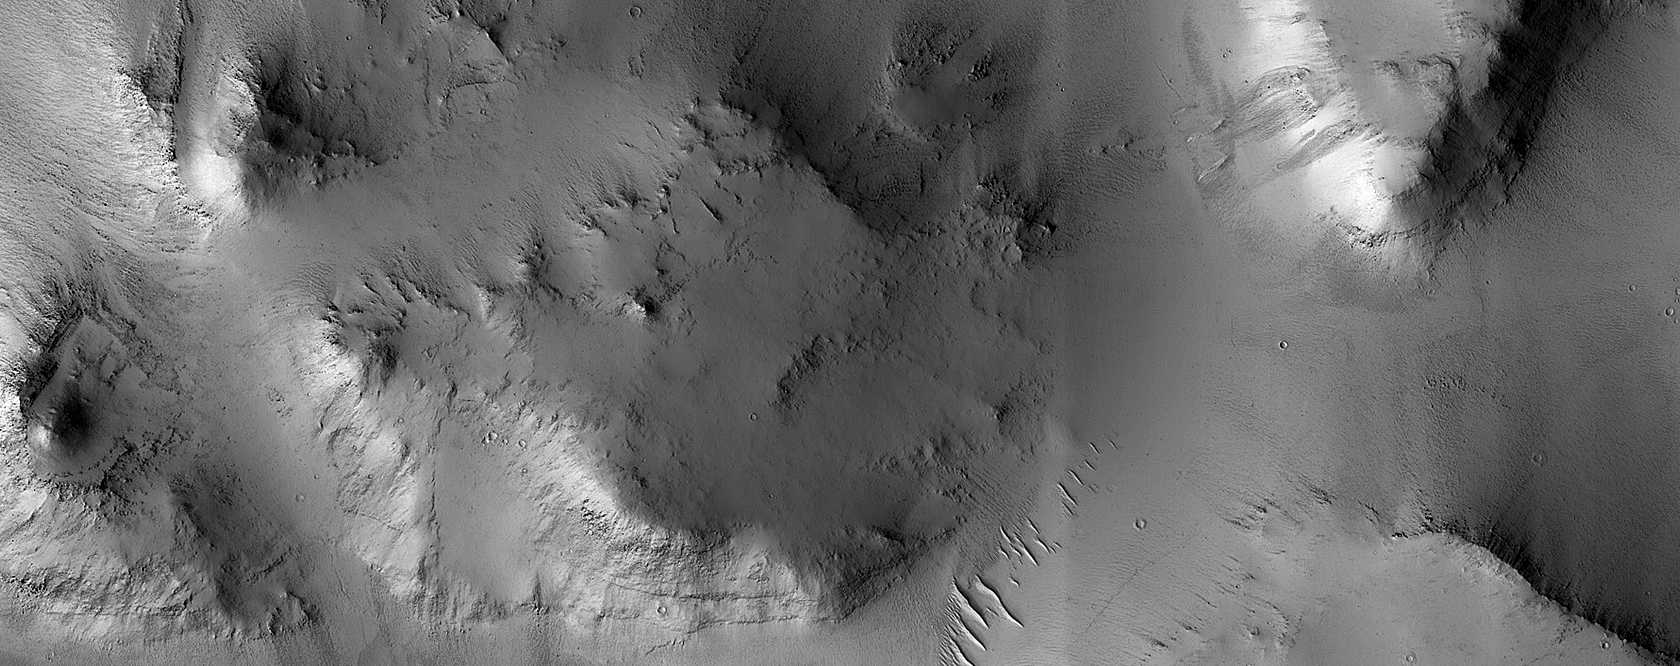 Layers in Blocks in East Arabia Terra